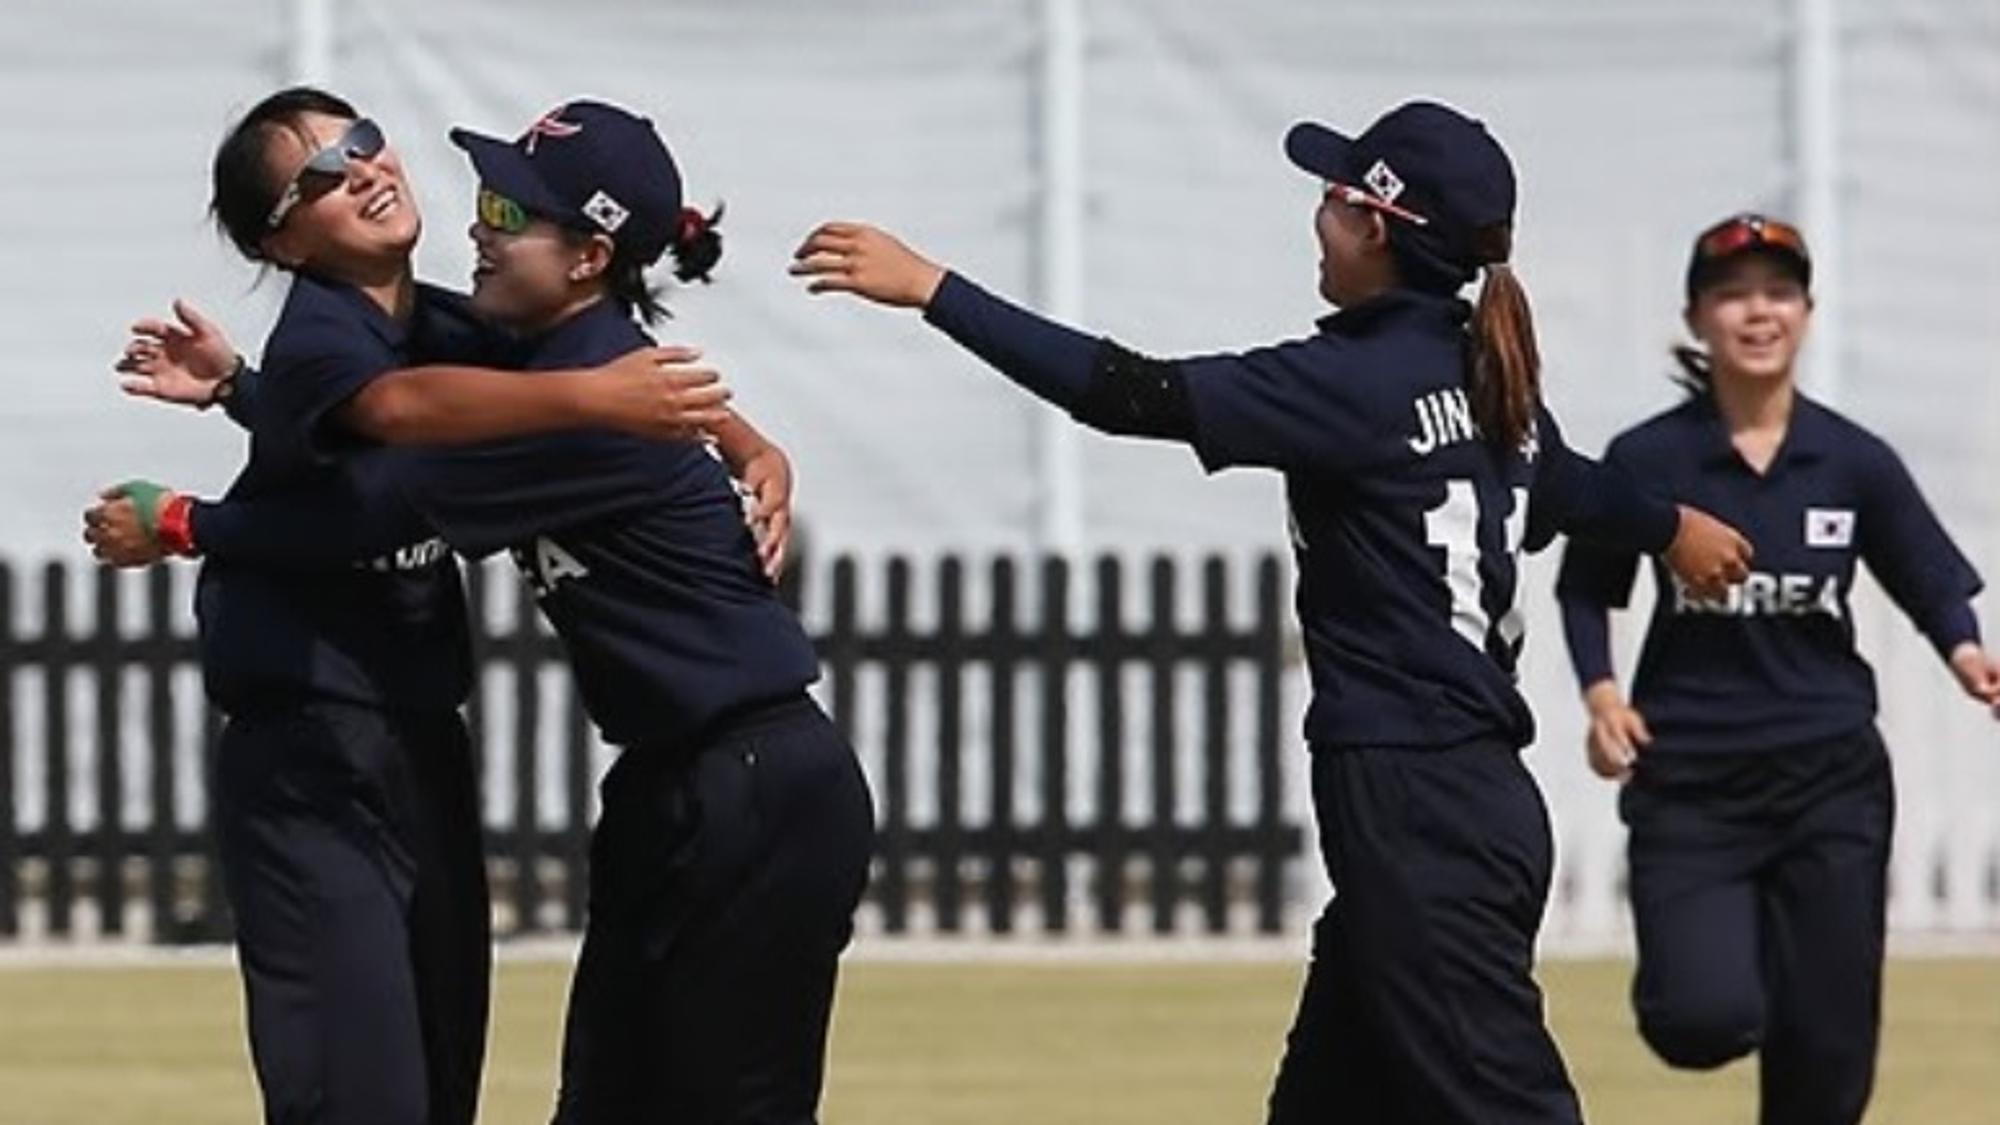 South Korea Women's Cricket Team